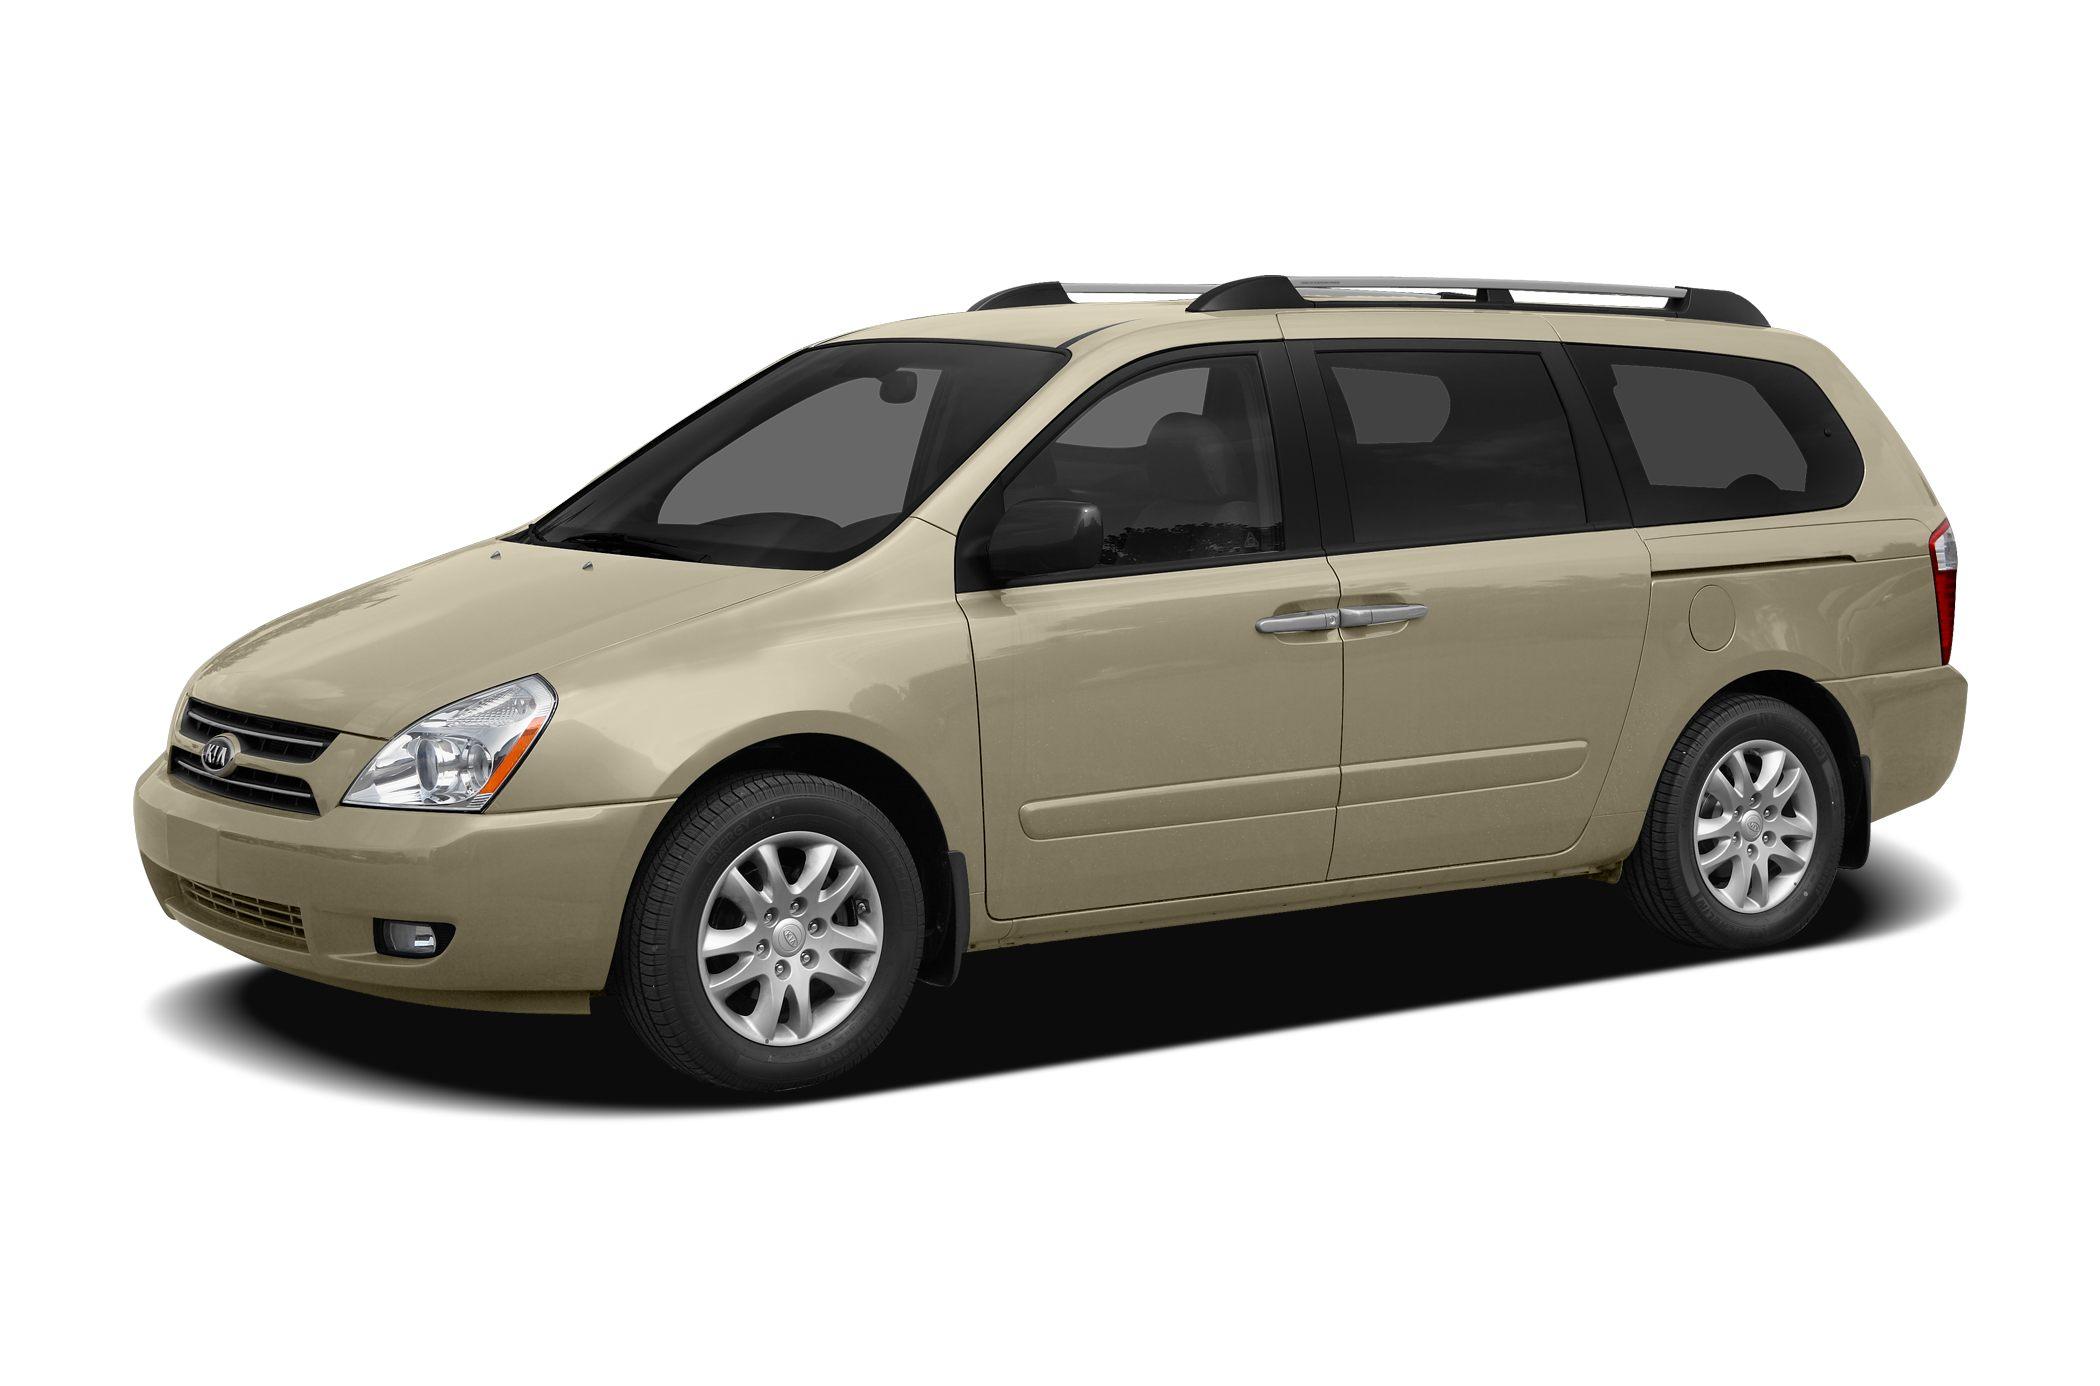 2010 Kia Sedona LX Minivan for sale in Nashville for $9,993 with 101,604 miles